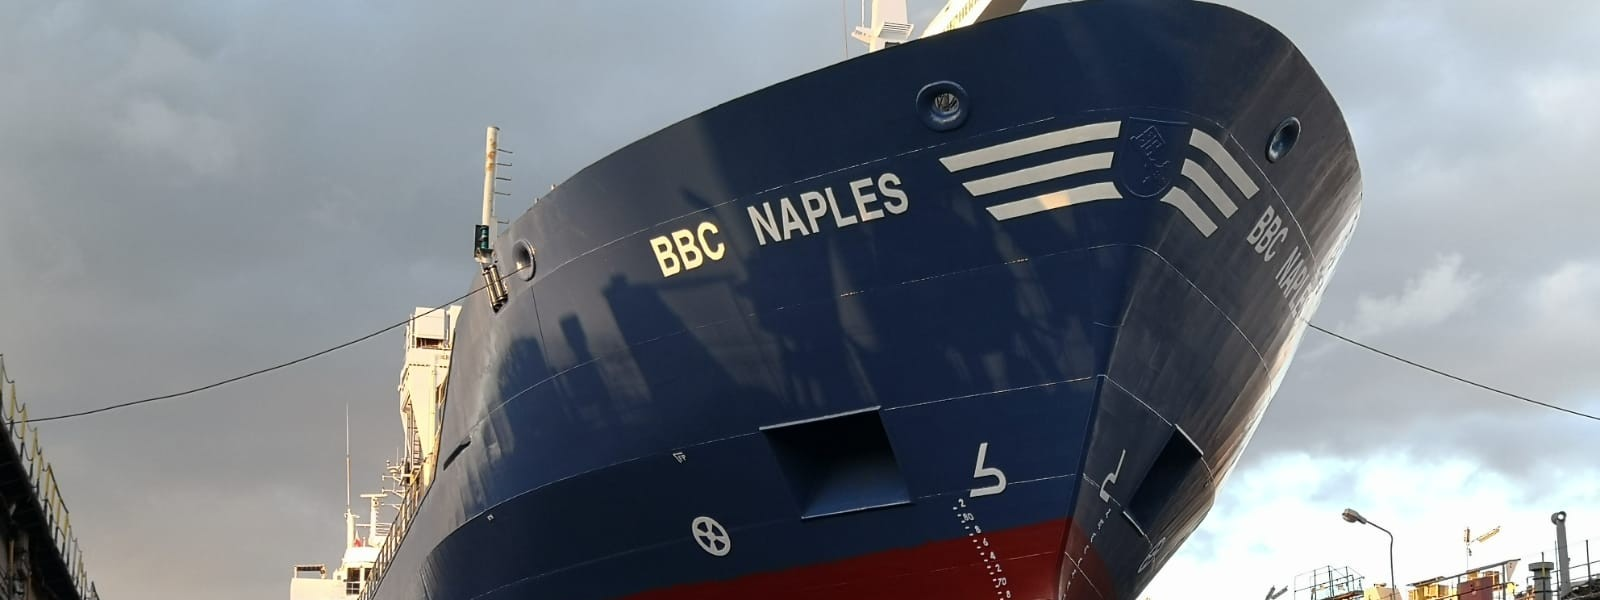 MEPA investigating MV BBC Naples which was carrying Uranium